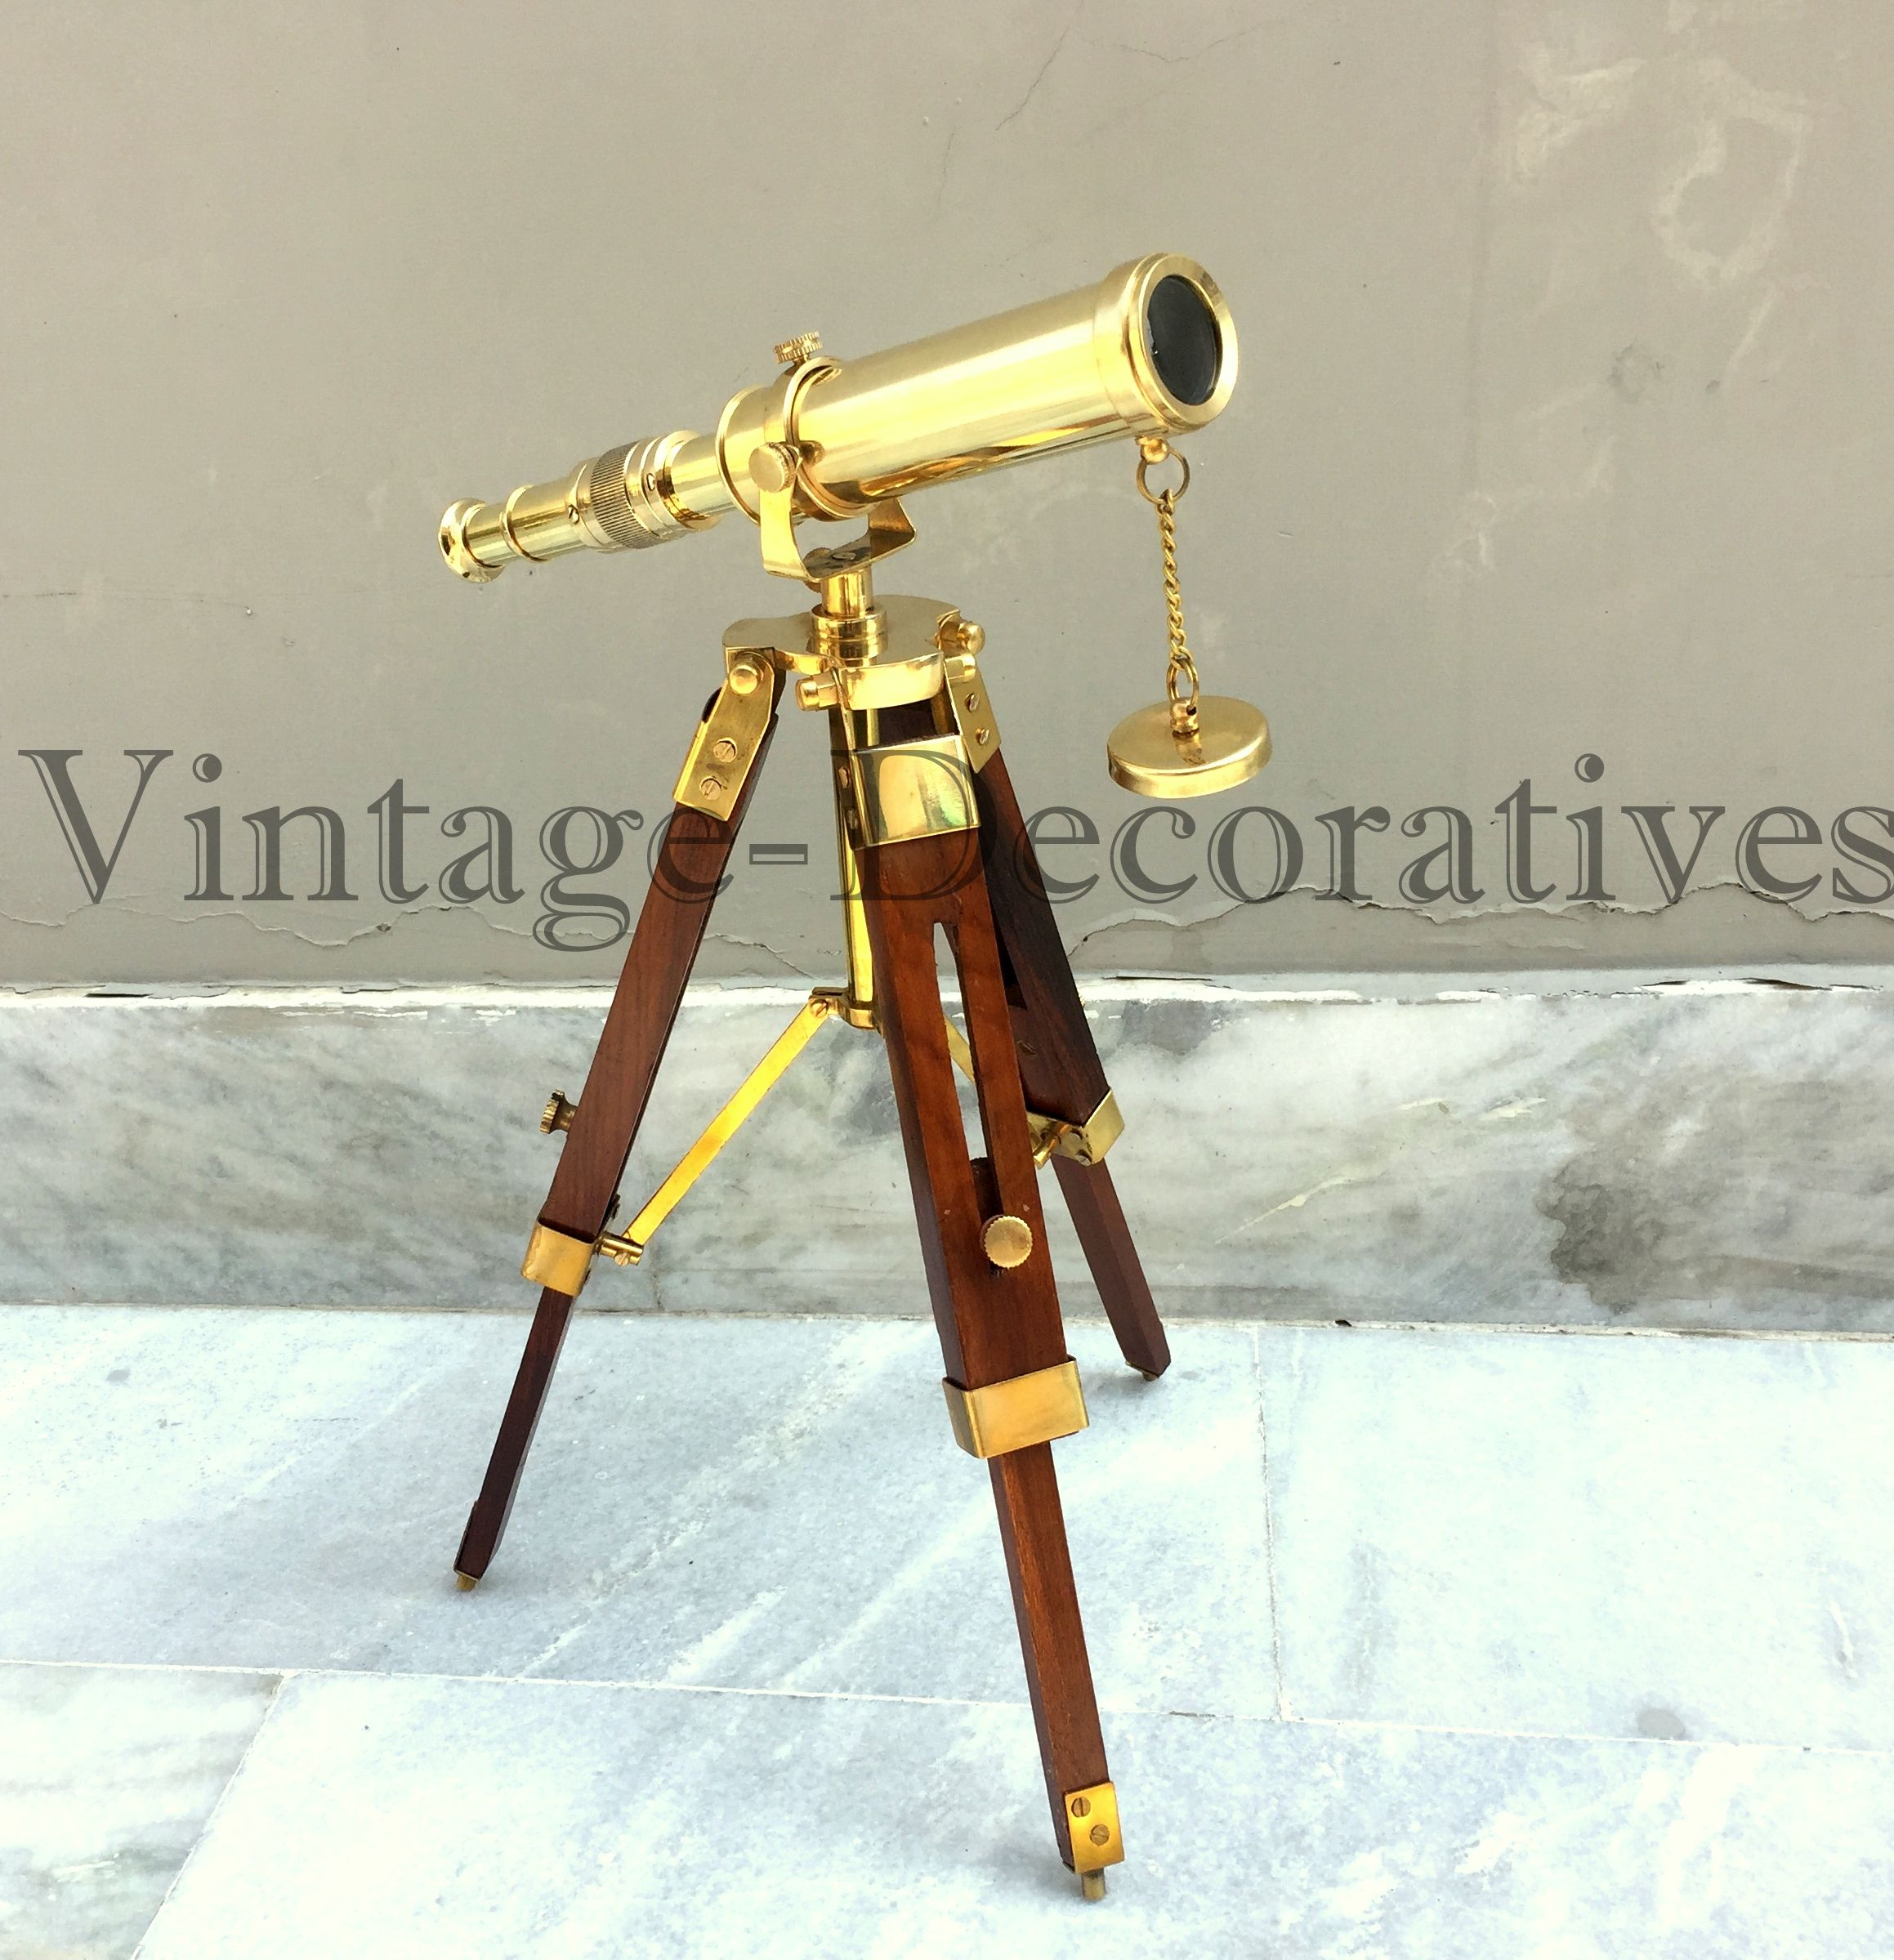 NAUTICAL ANTIQUE DESIGN SCOPE TELESCOPE MARINE VINTAGE TRIPOD OLD NAVY TELESCOPE